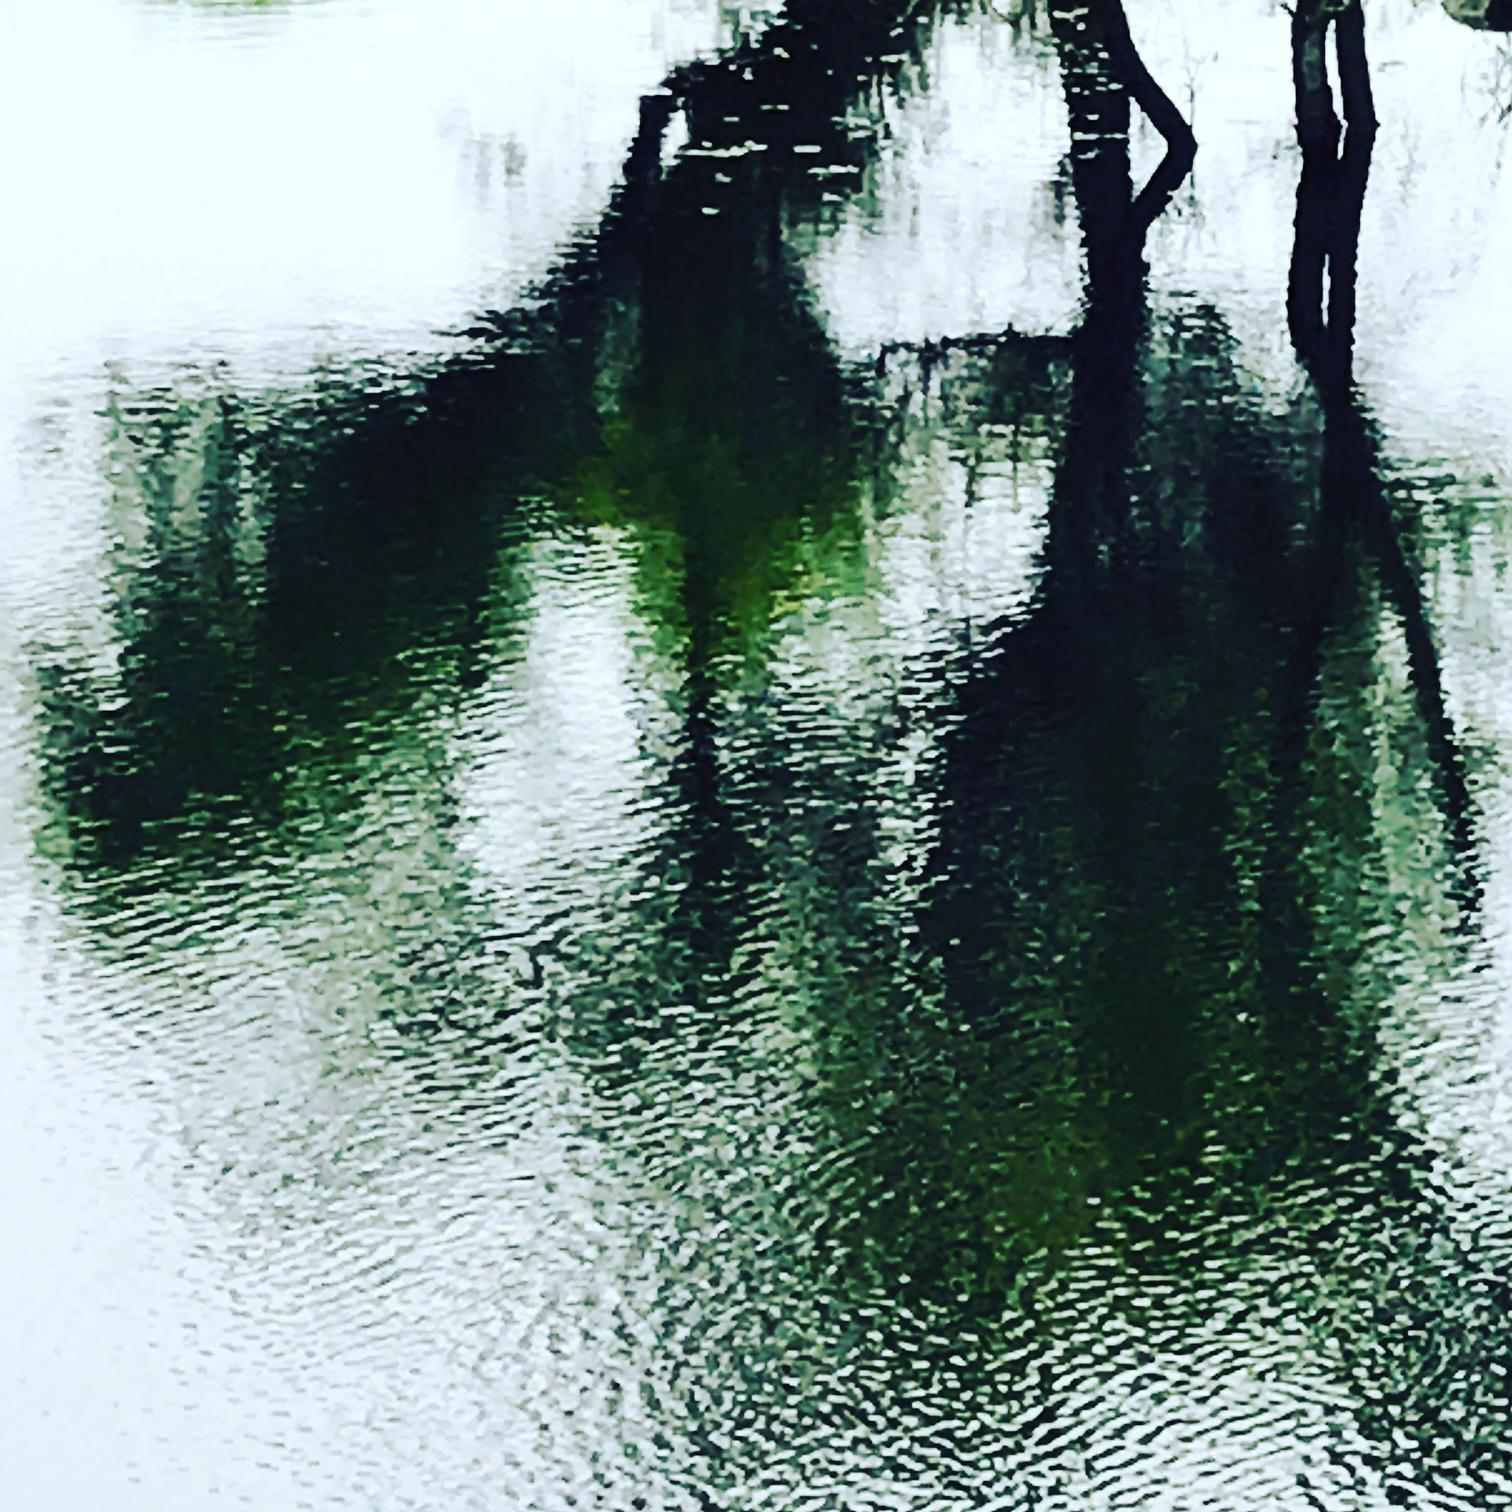 river abstract.JPG